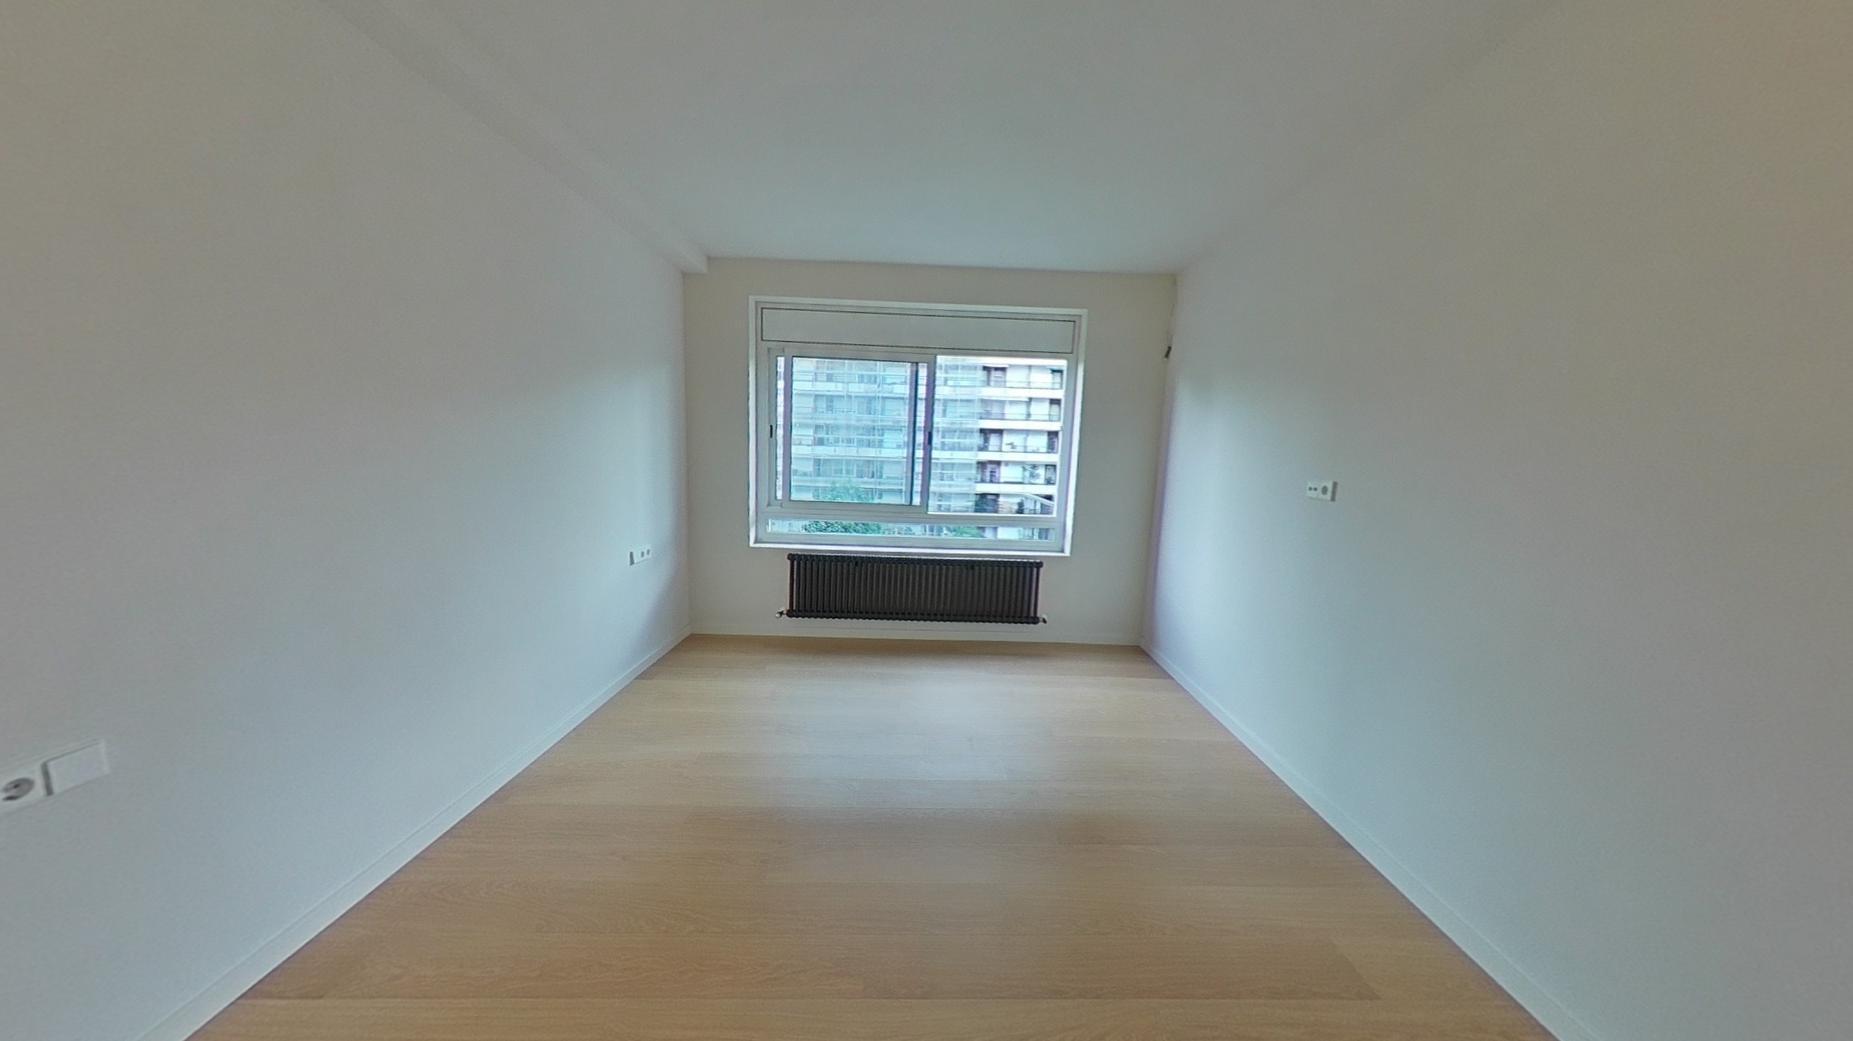 253492 Flat for sale in Sarrià-Sant Gervasi, Sant Gervasi-Galvany 26